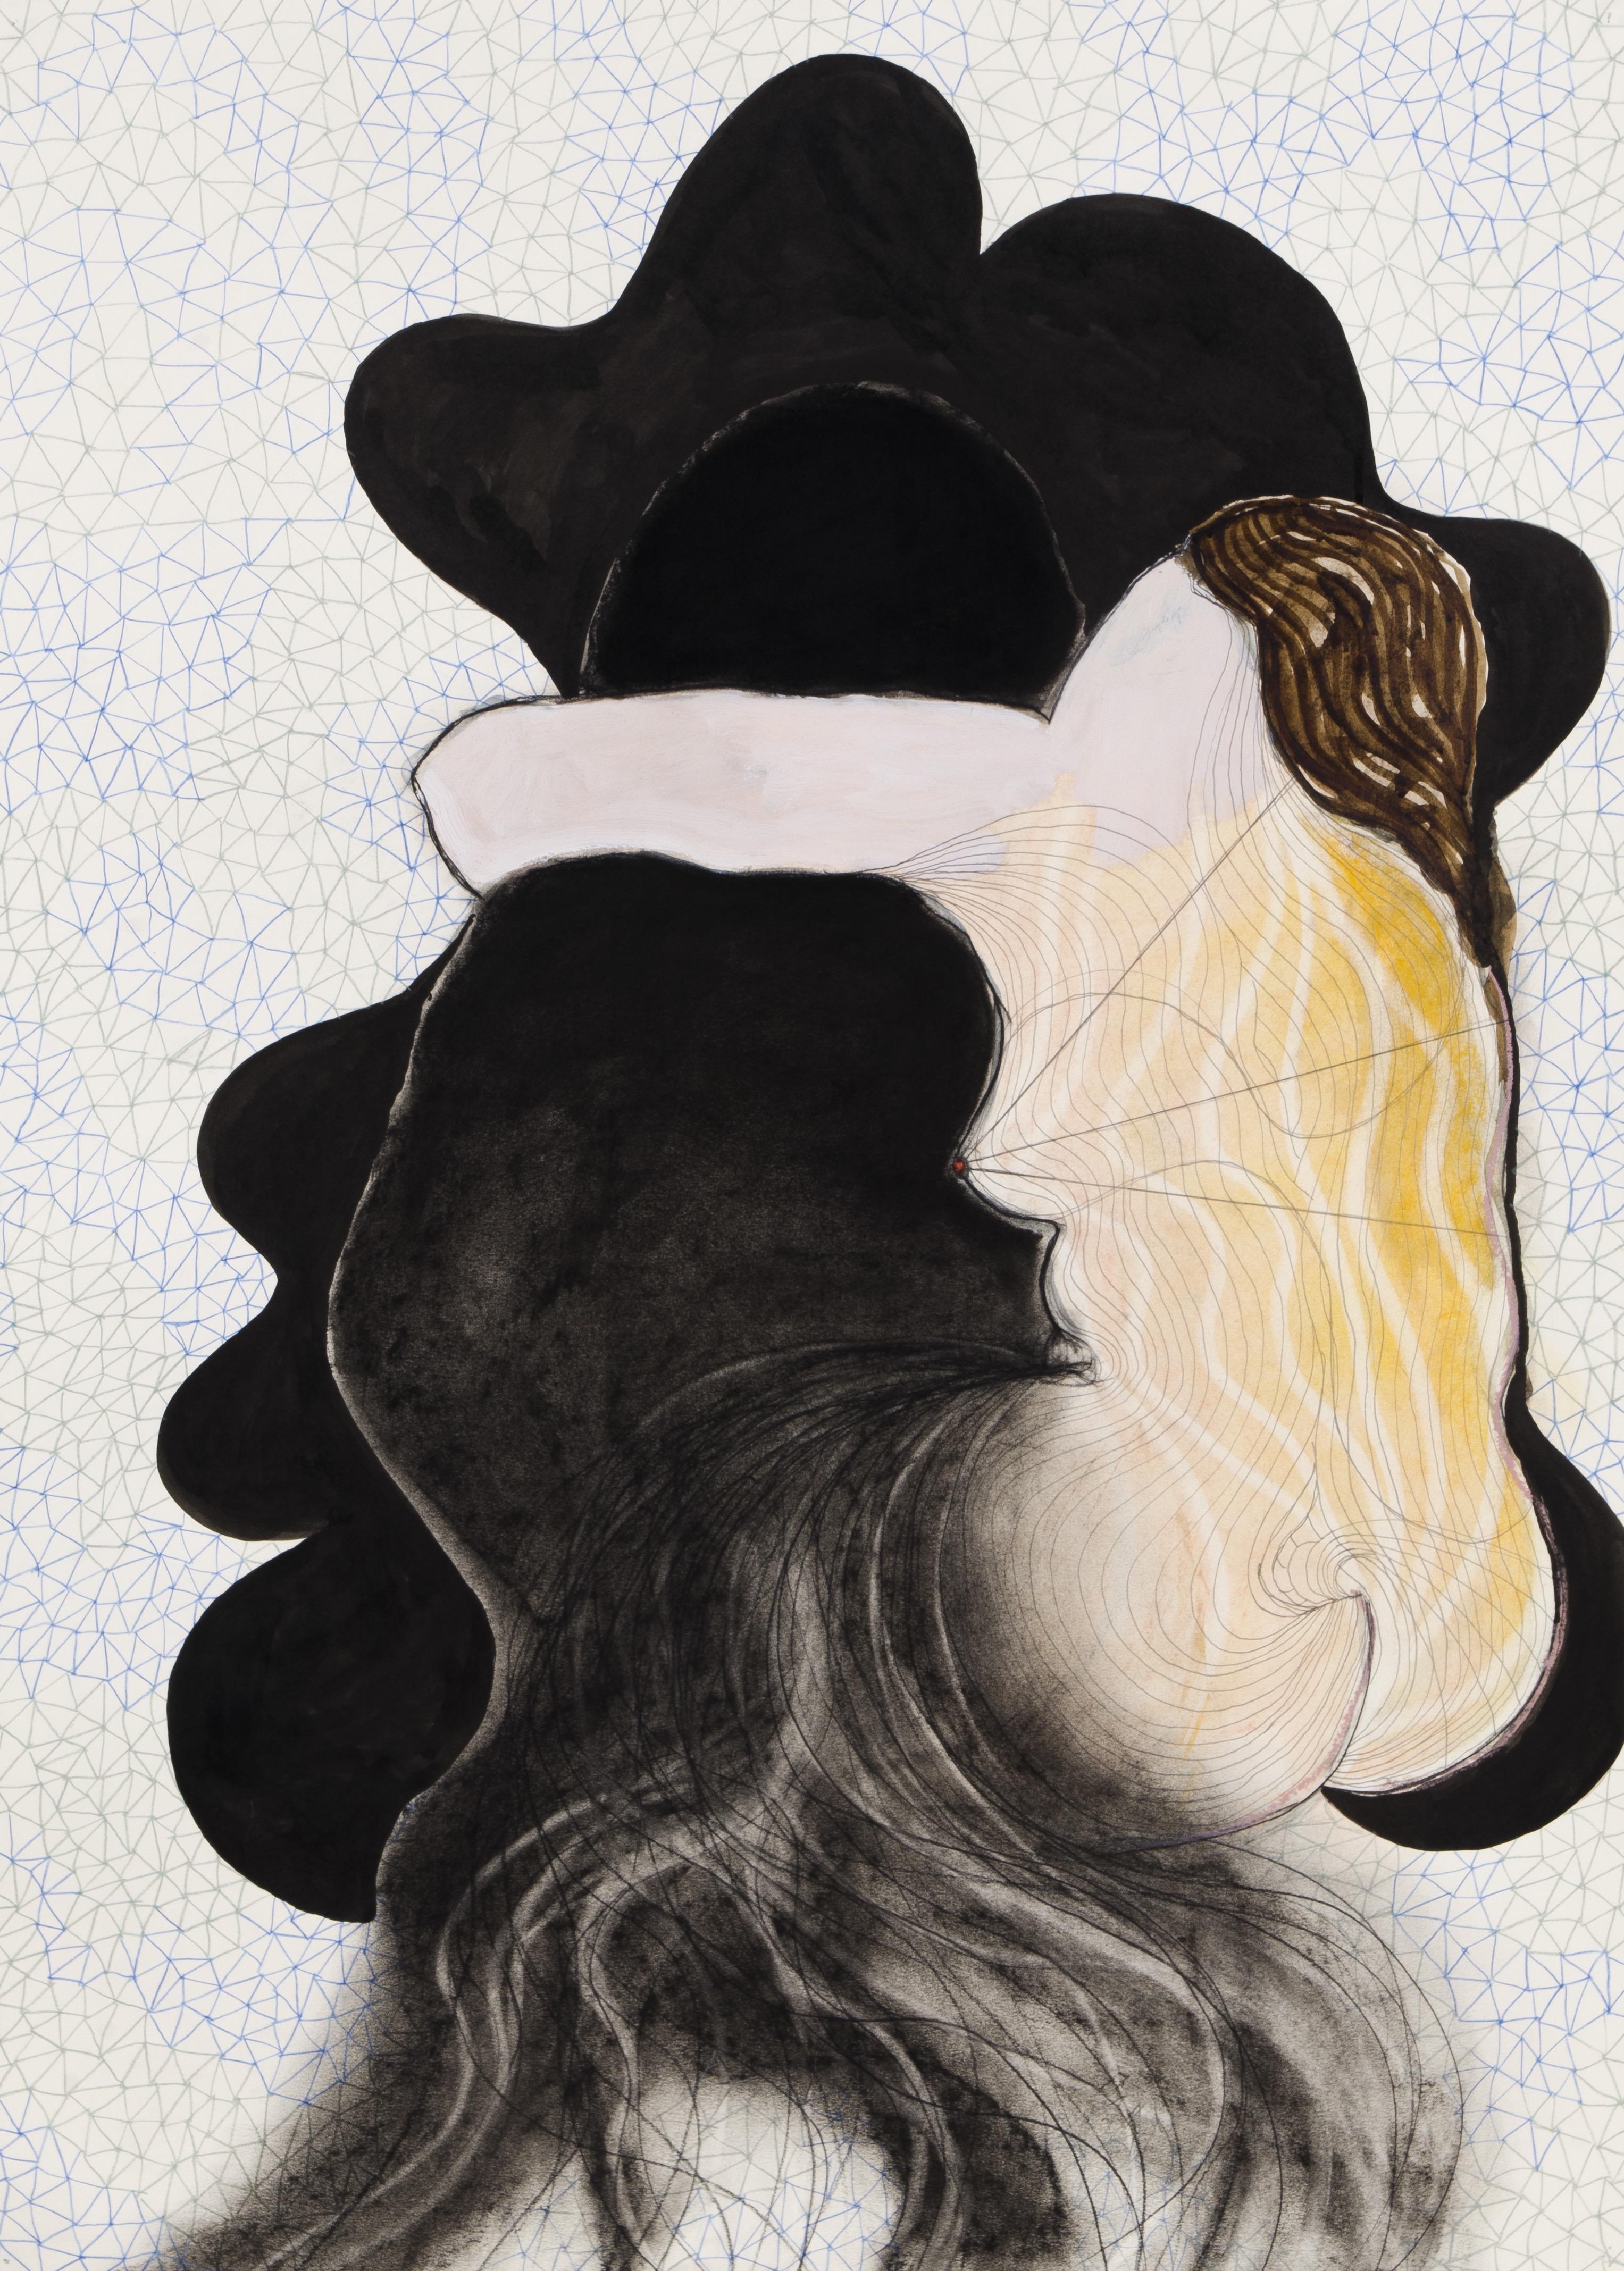 'Persephone' series, mixed media on paper, 100 X 70 cm, 2014